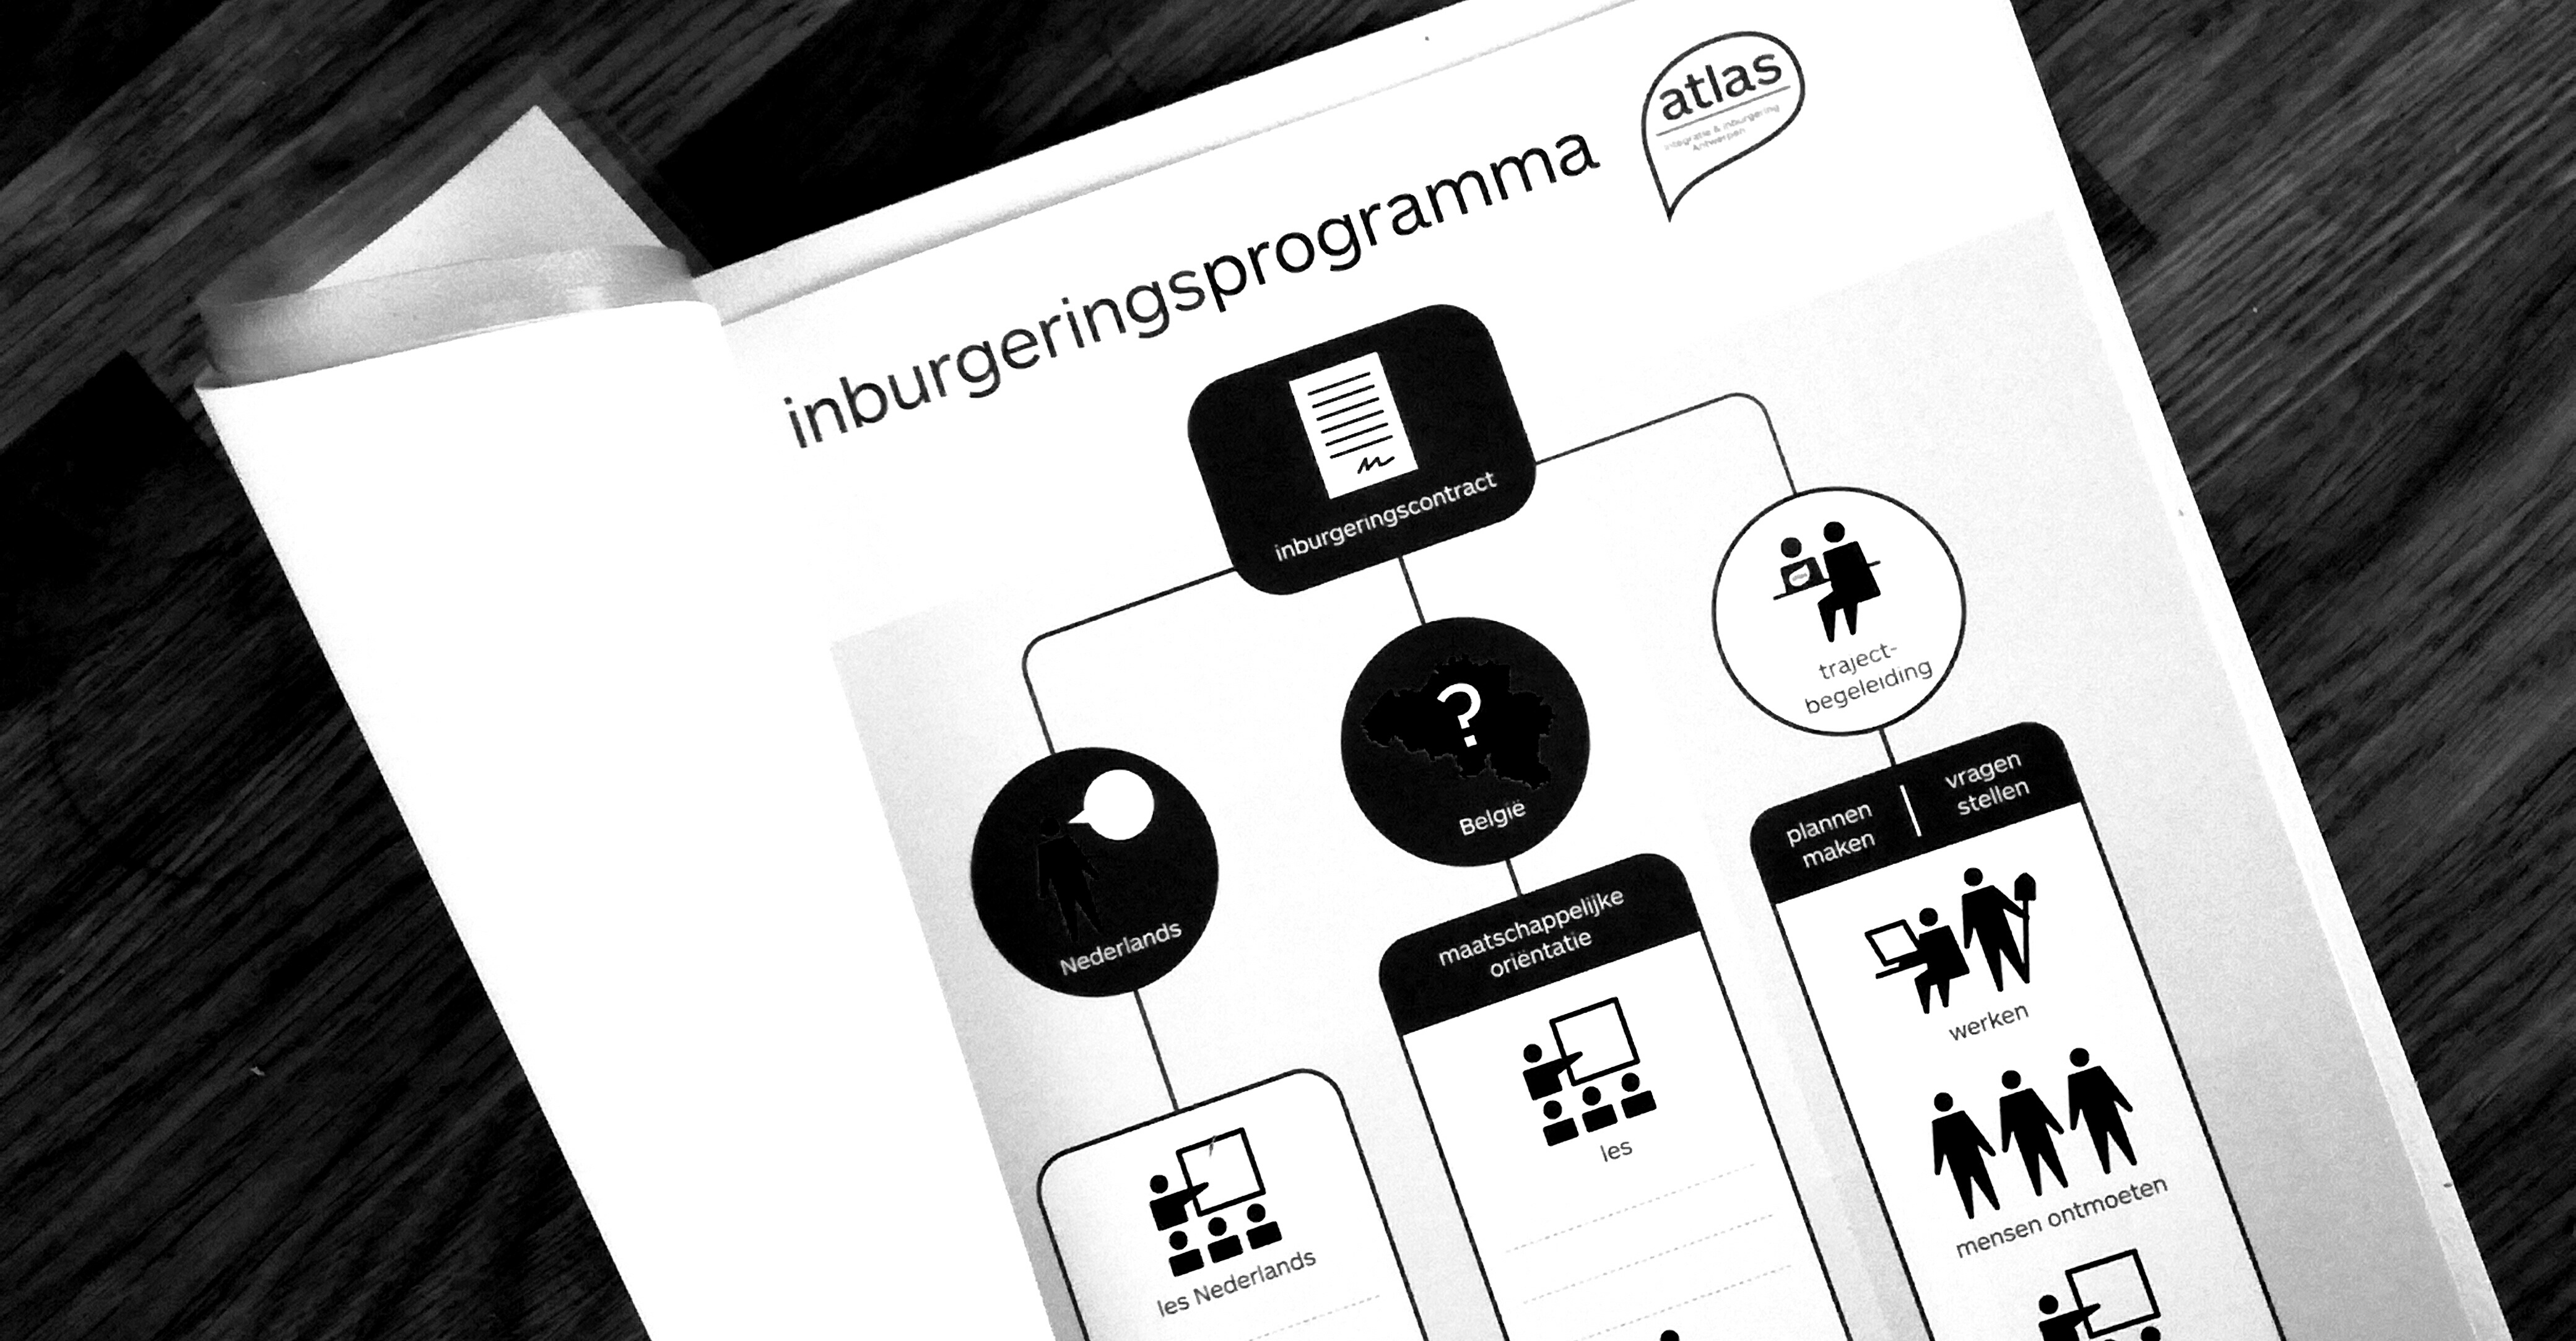 Inburgeringprogramma Atlas Antwerpen